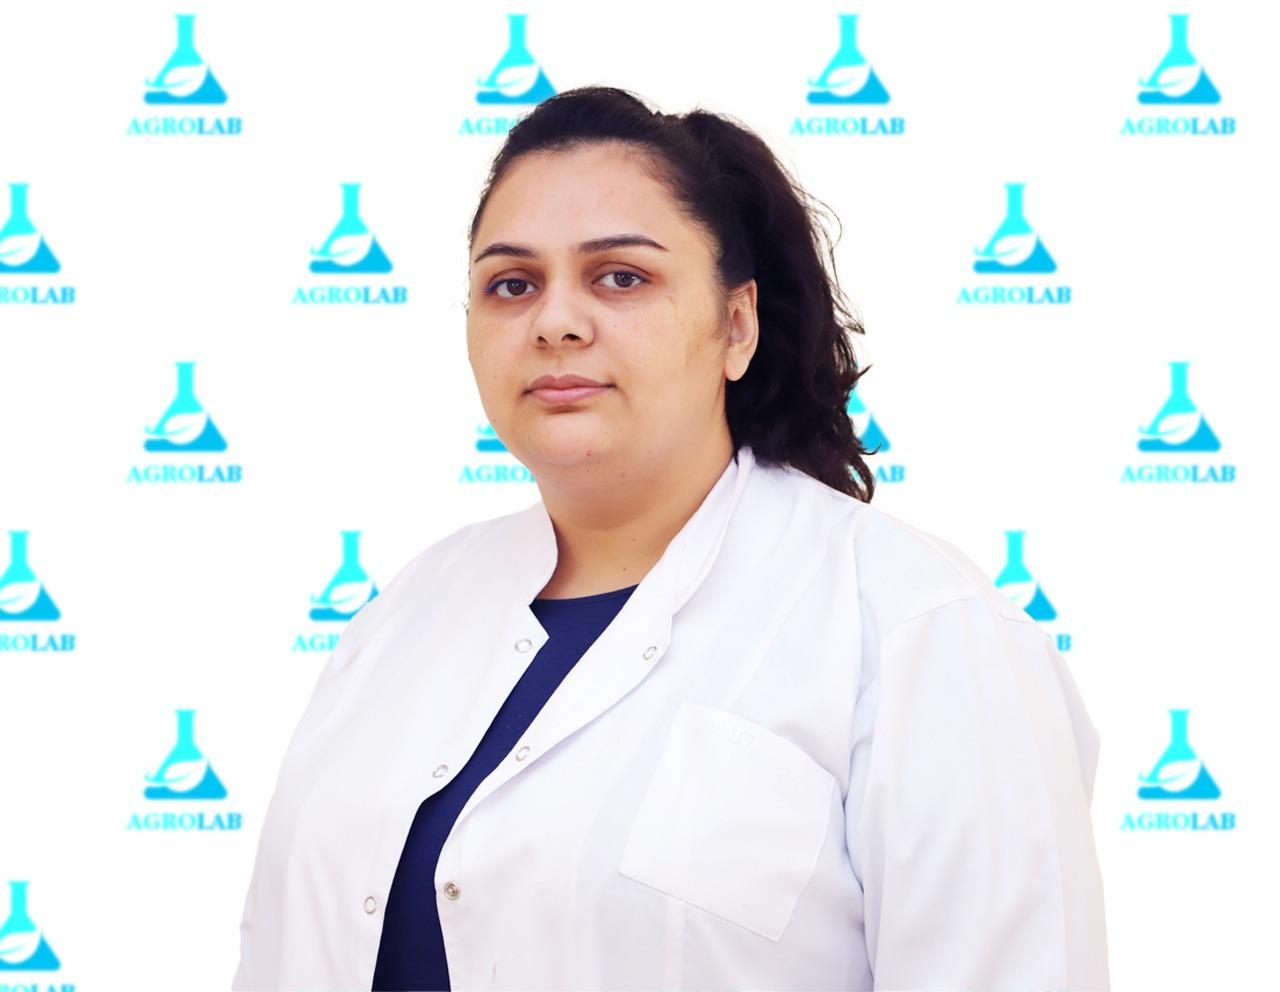 Aytəkin Mahmudova